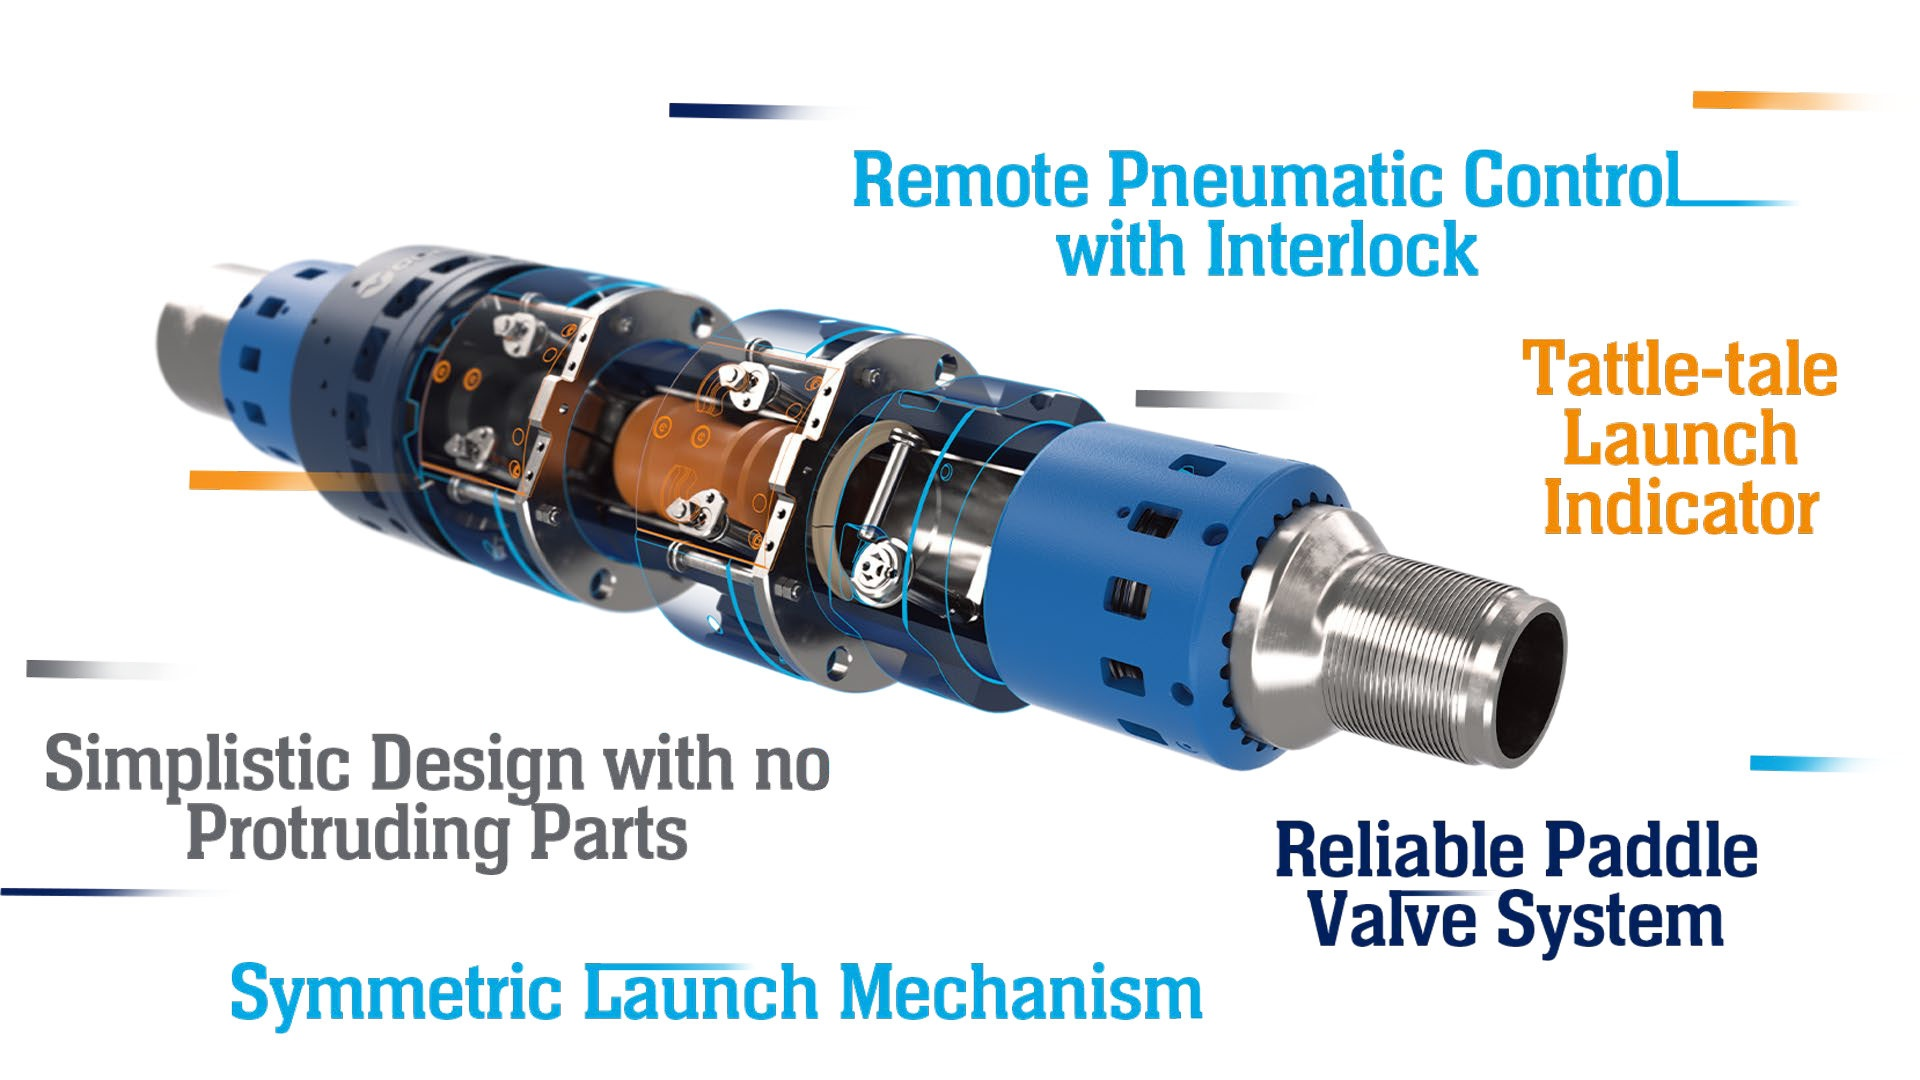 Plug Launcher Volant Products